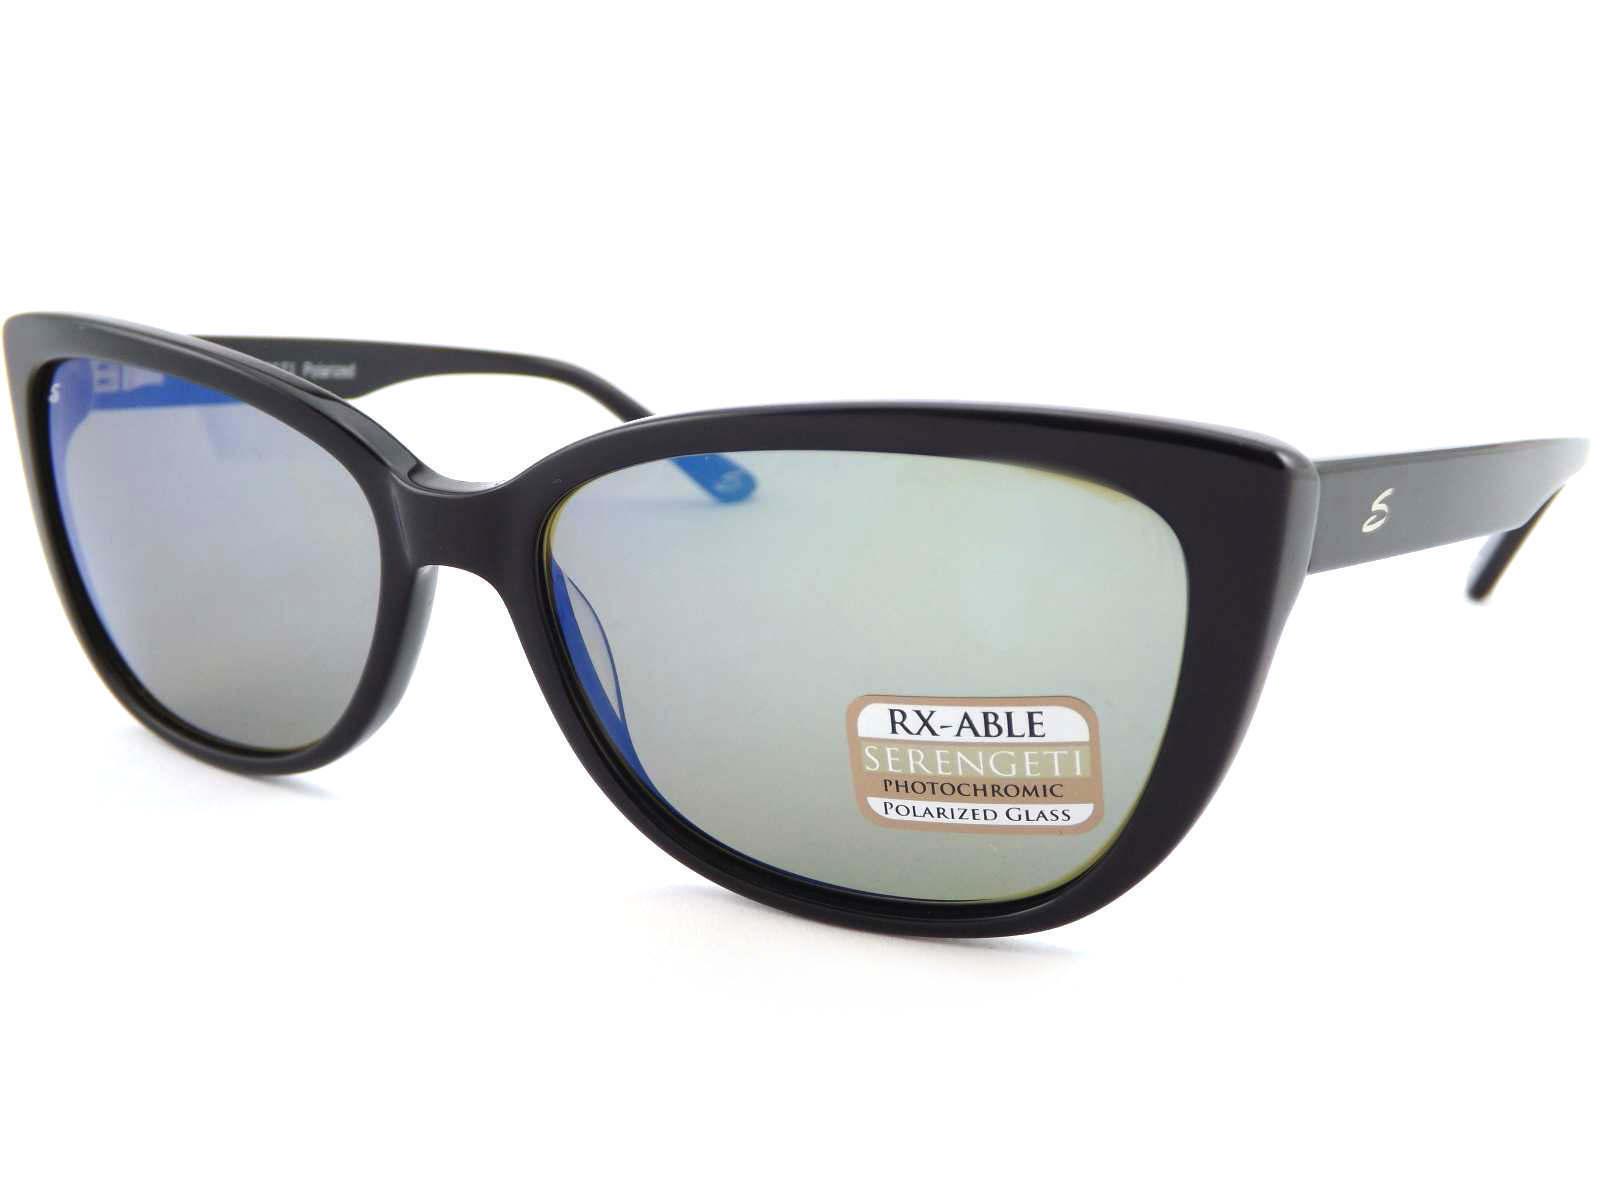 bd6dce8bf13 Details about SERENGETI womens SOPHIA polarized Sunglasses Shiny Black  555  Blue Mirror 8280